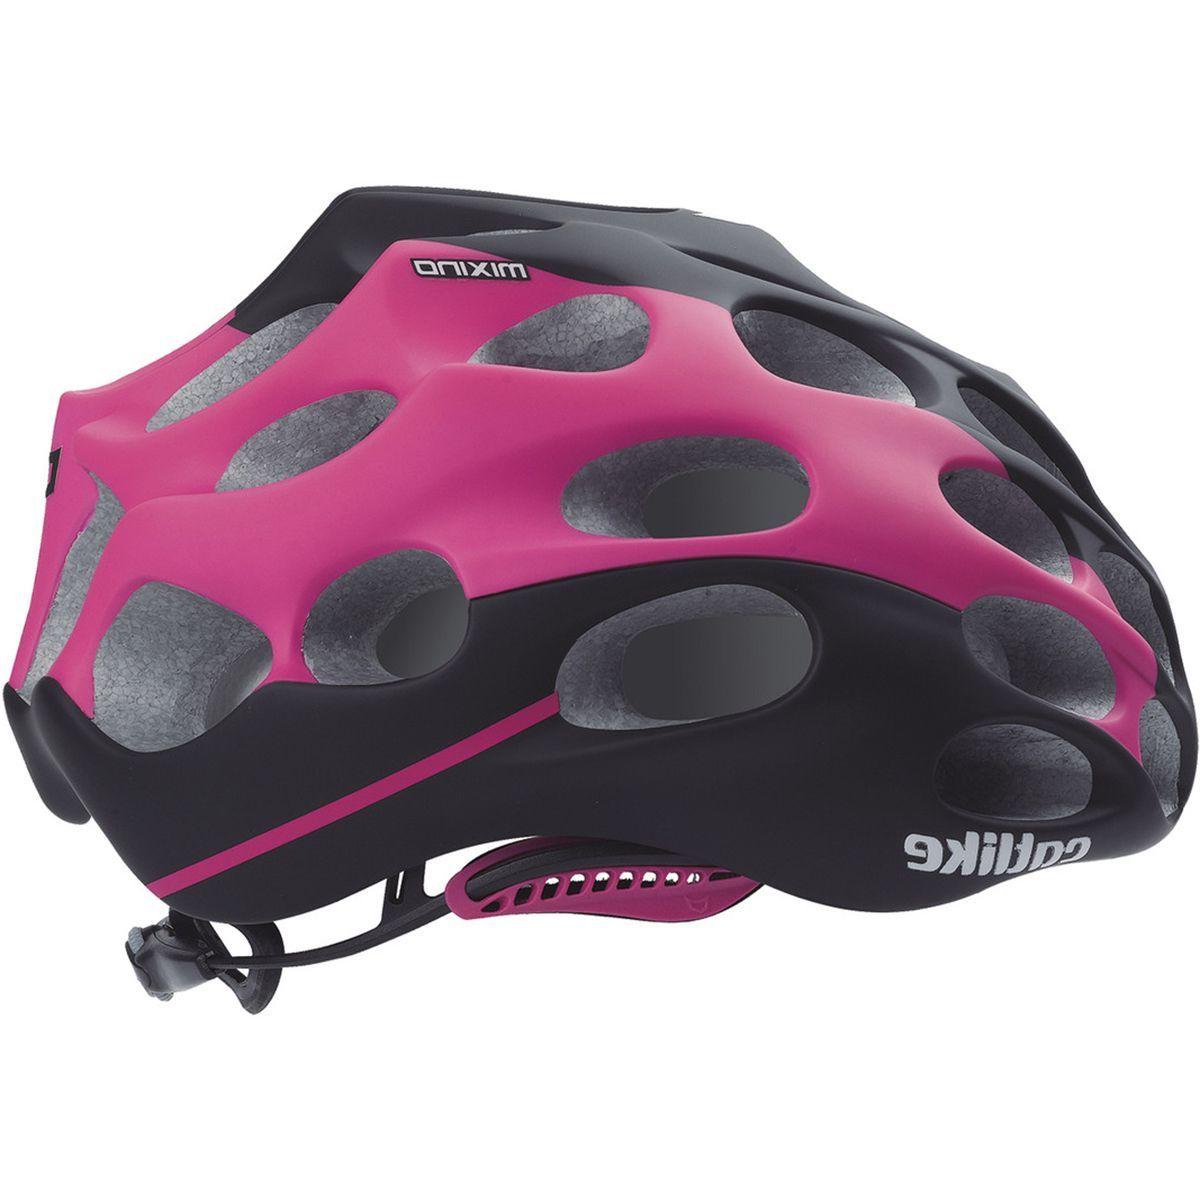 Catlike Mixino Helmet - Men's